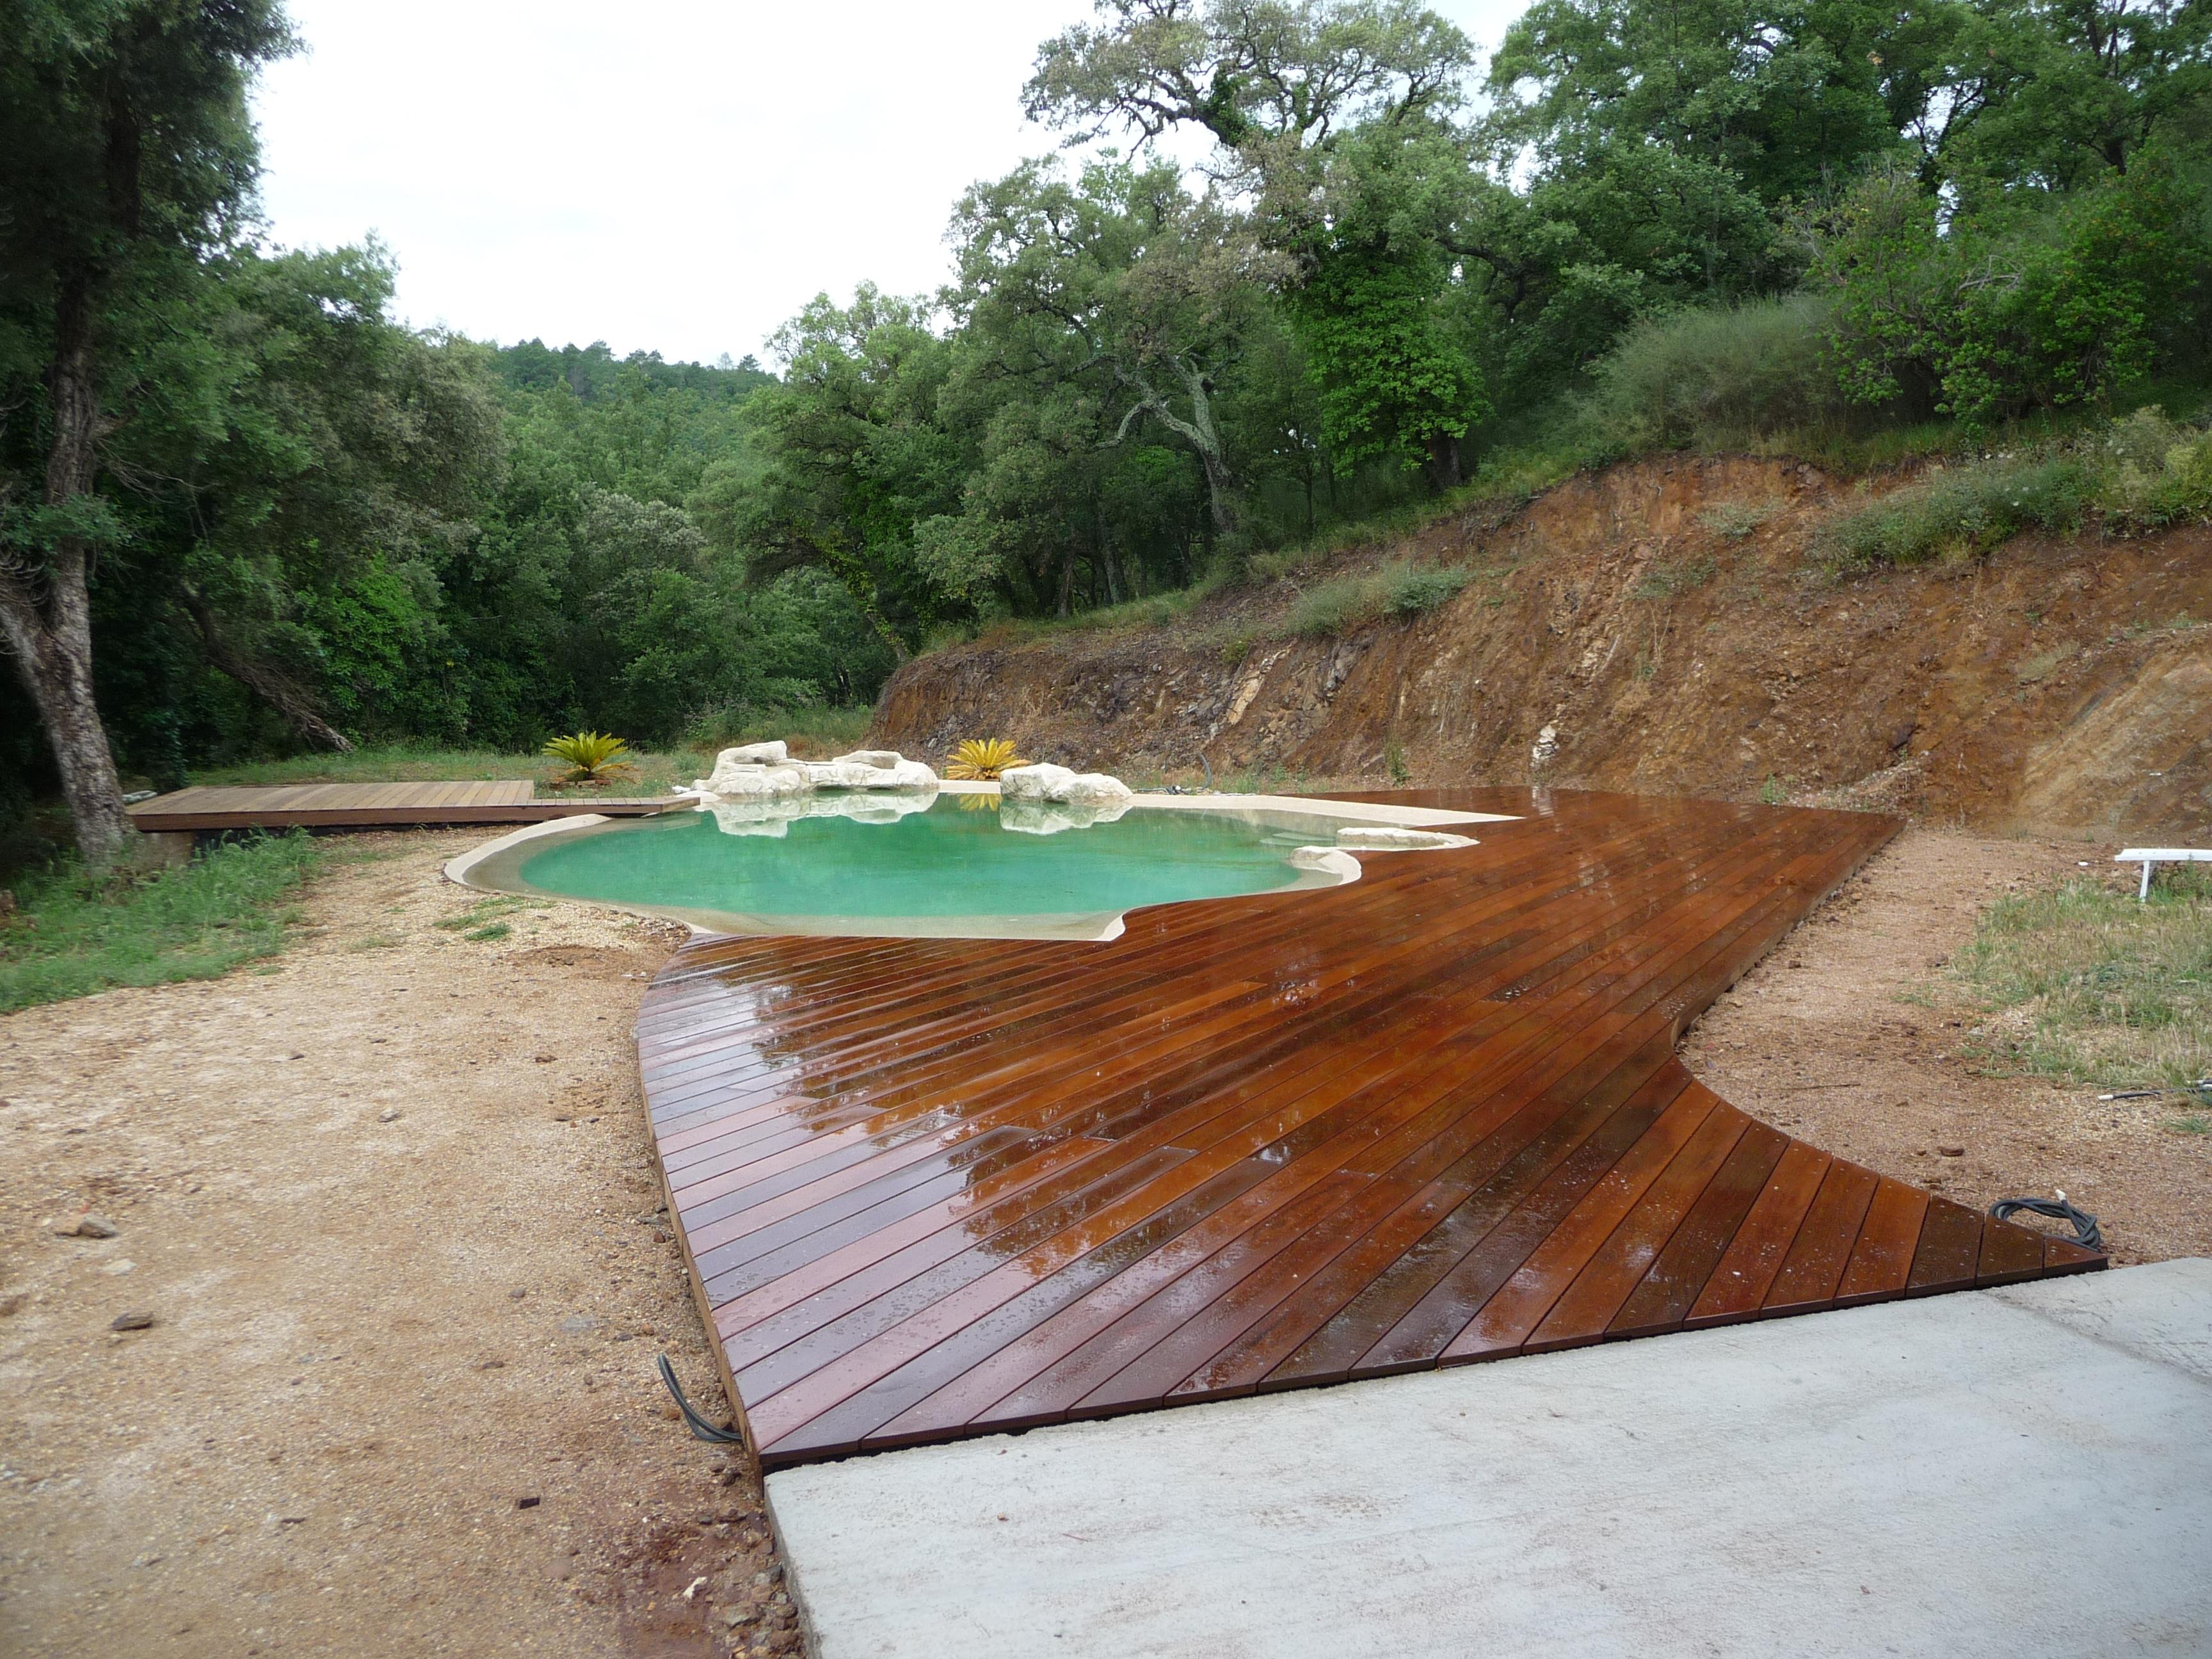 Générale-Construction » Terrasse De Piscine En Ipe avec Terrasse Ipe Piscine